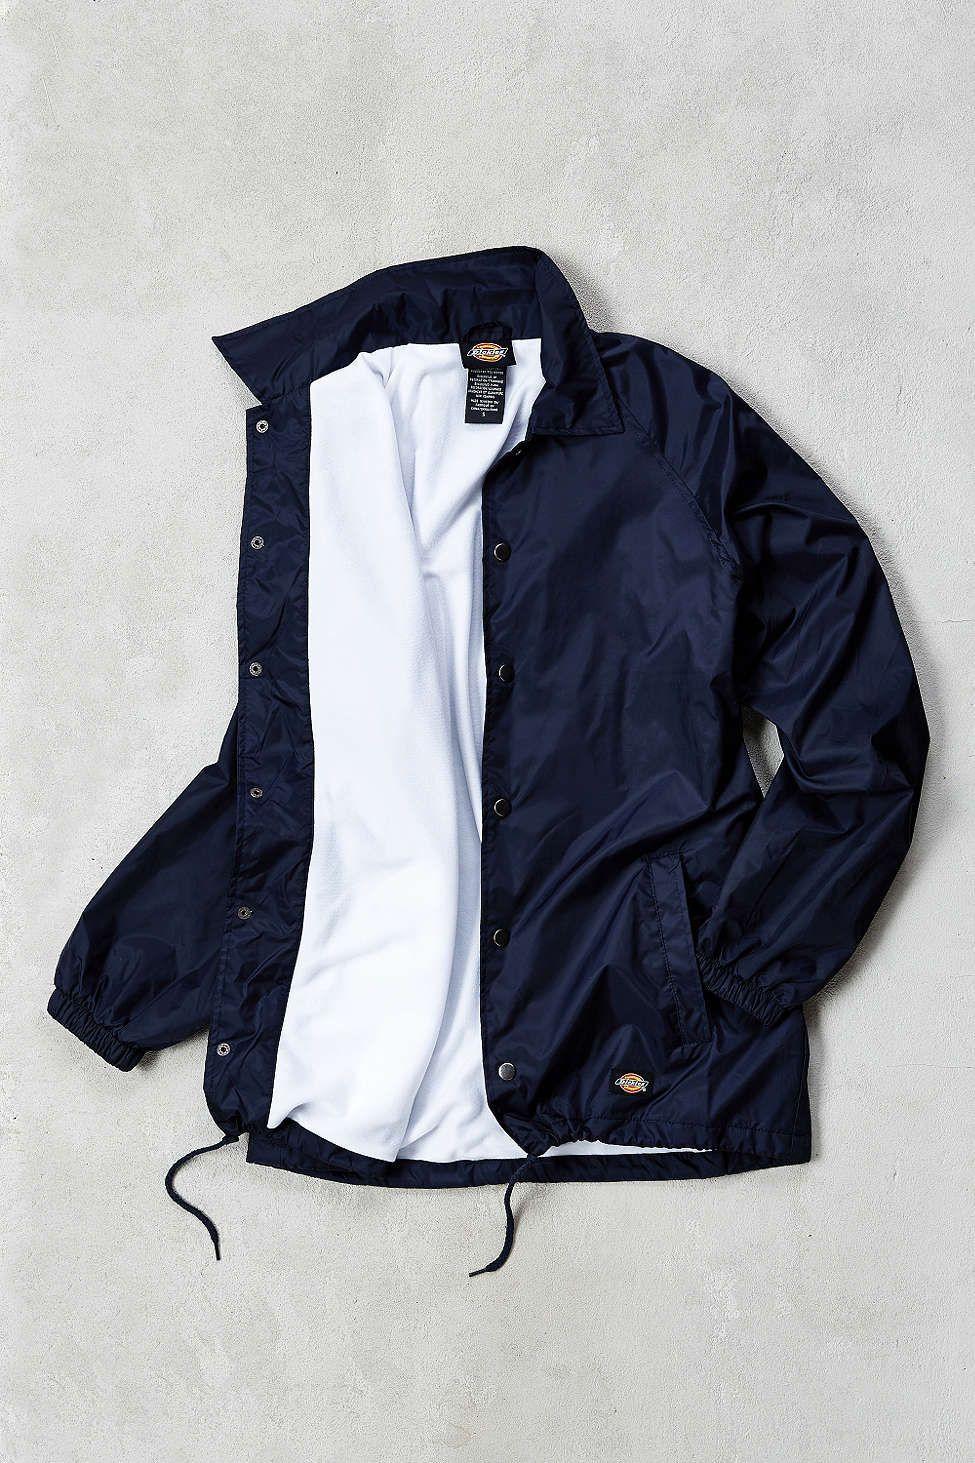 outlet store edbb7 34190 Dickies Snap Front Nylon Coaches Jacket